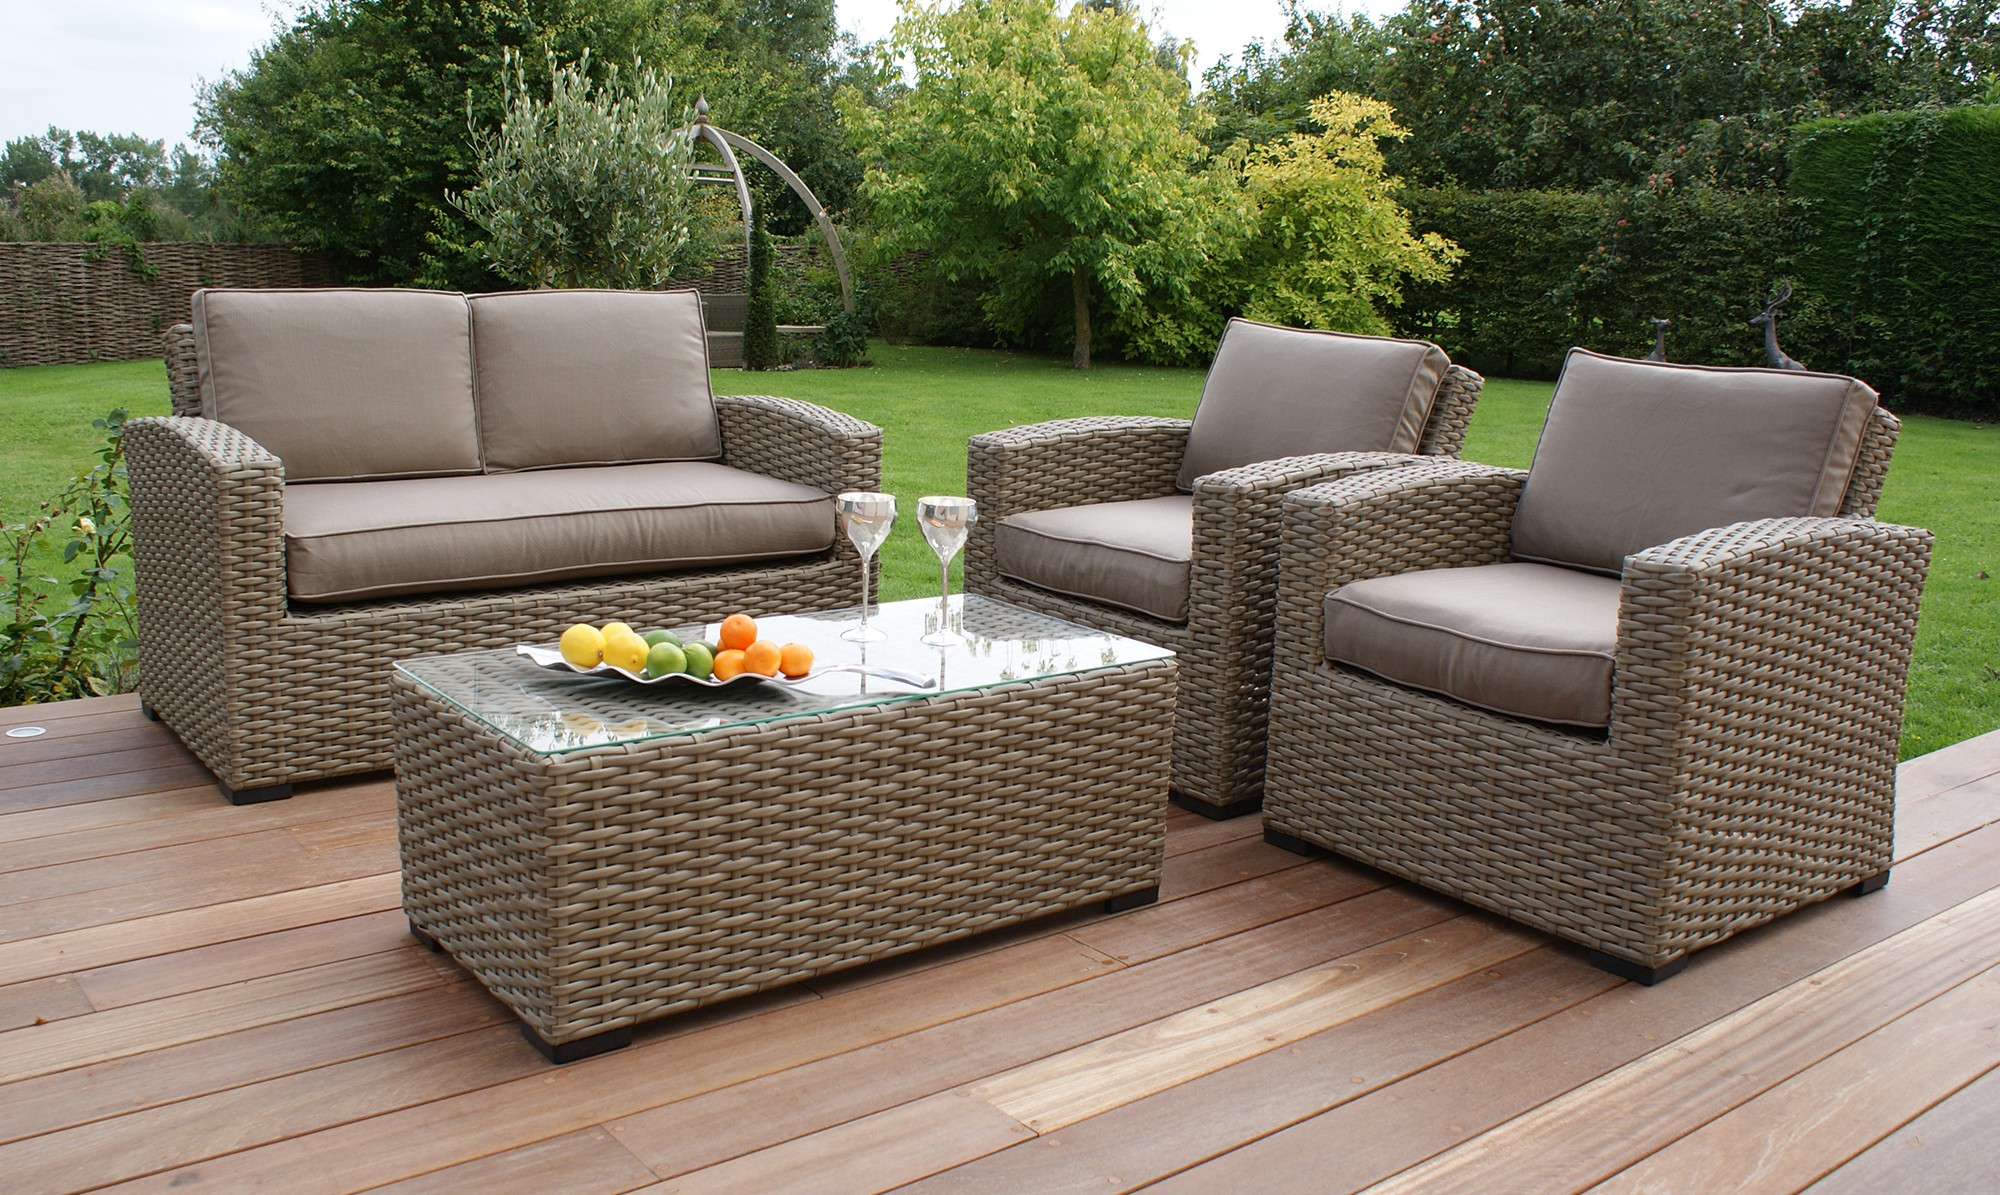 Choose the perfect designs of garden rattan furniture